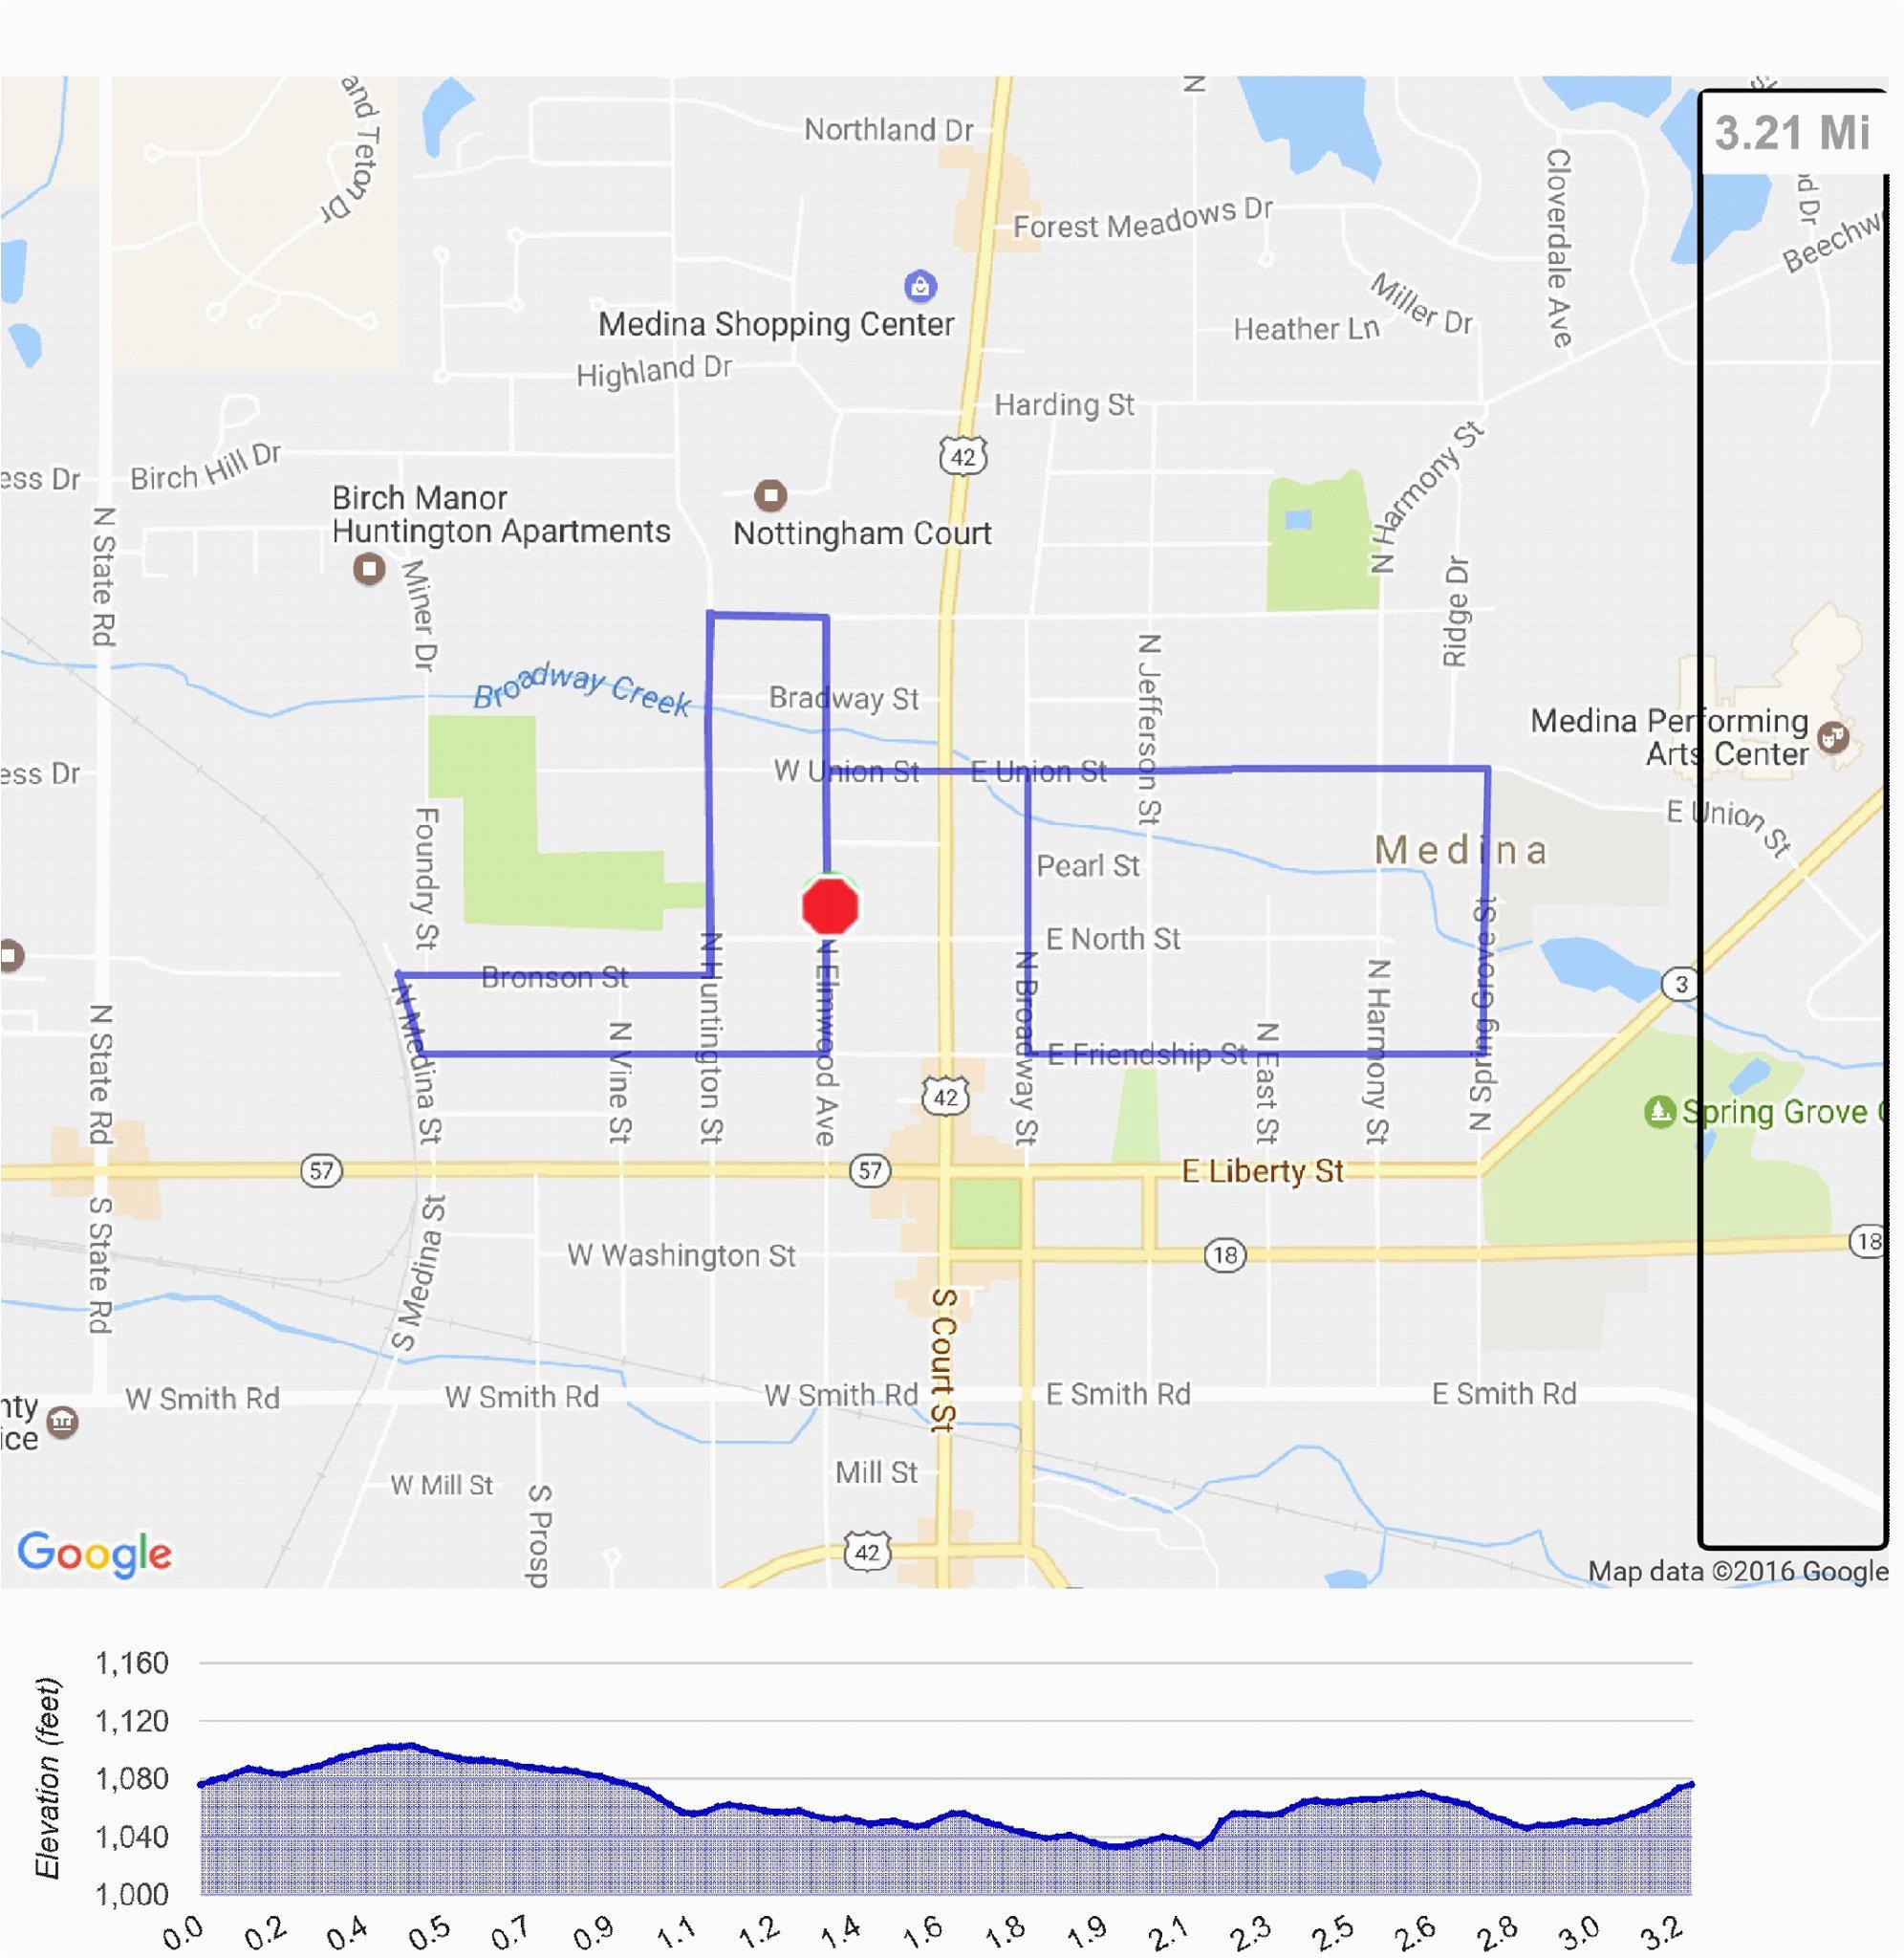 2019 water tower district 5k historic hustle medina ohio